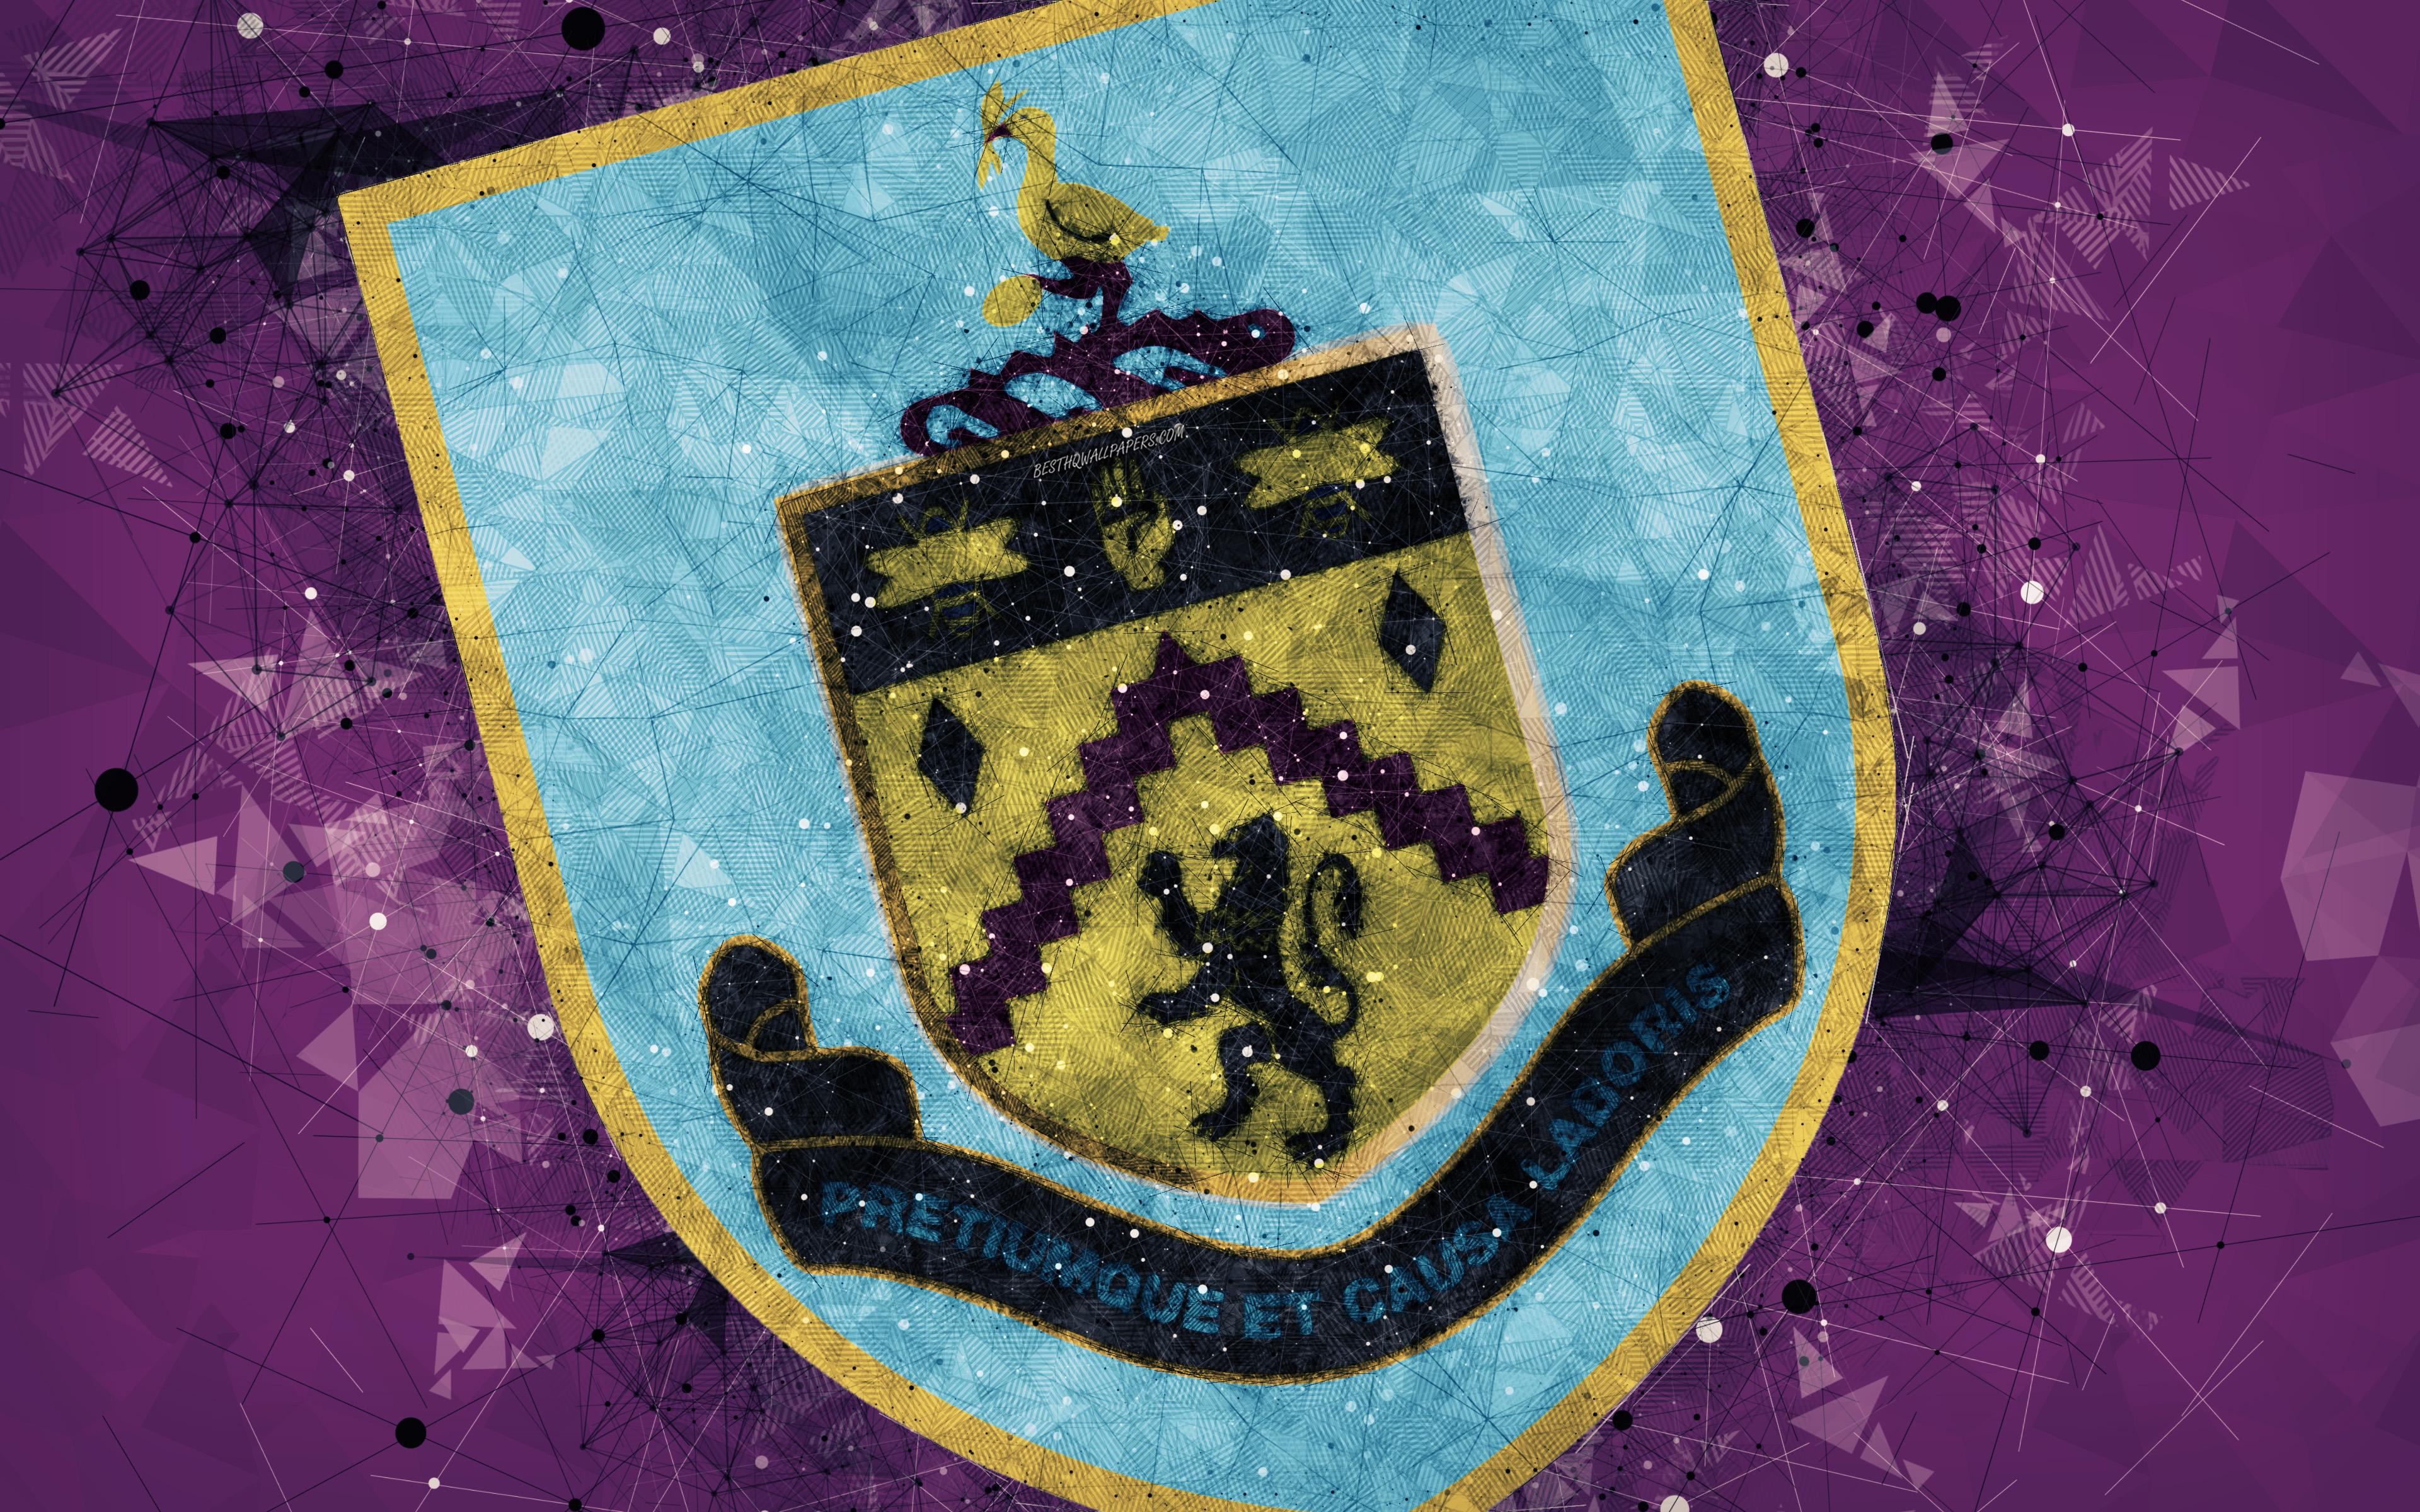 Download wallpapers Burnley FC 4k logo geometric art English 3840x2400